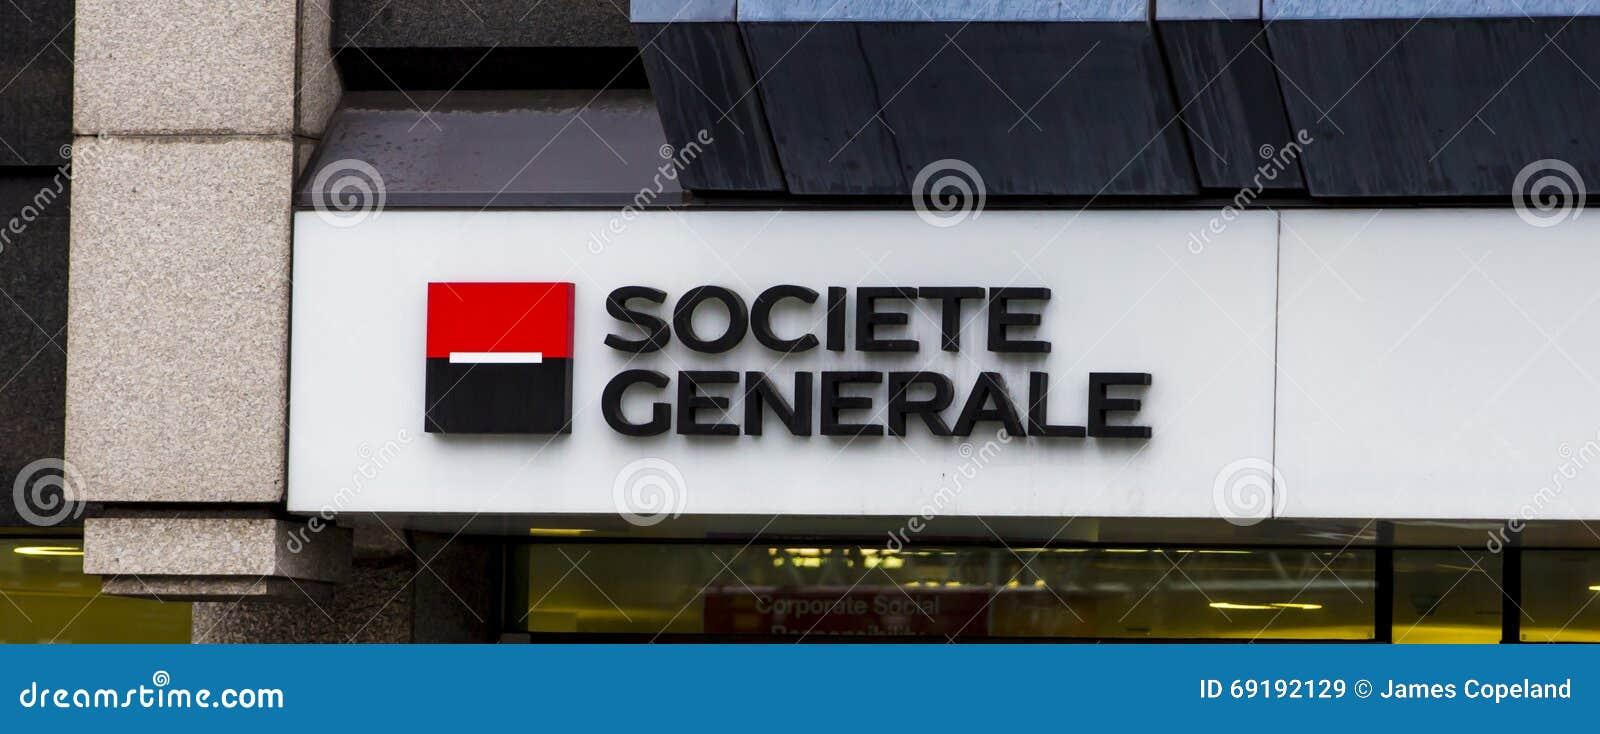 Societe generale logo on headquarters building editorial image 21168910 - Societe generale uk head office ...